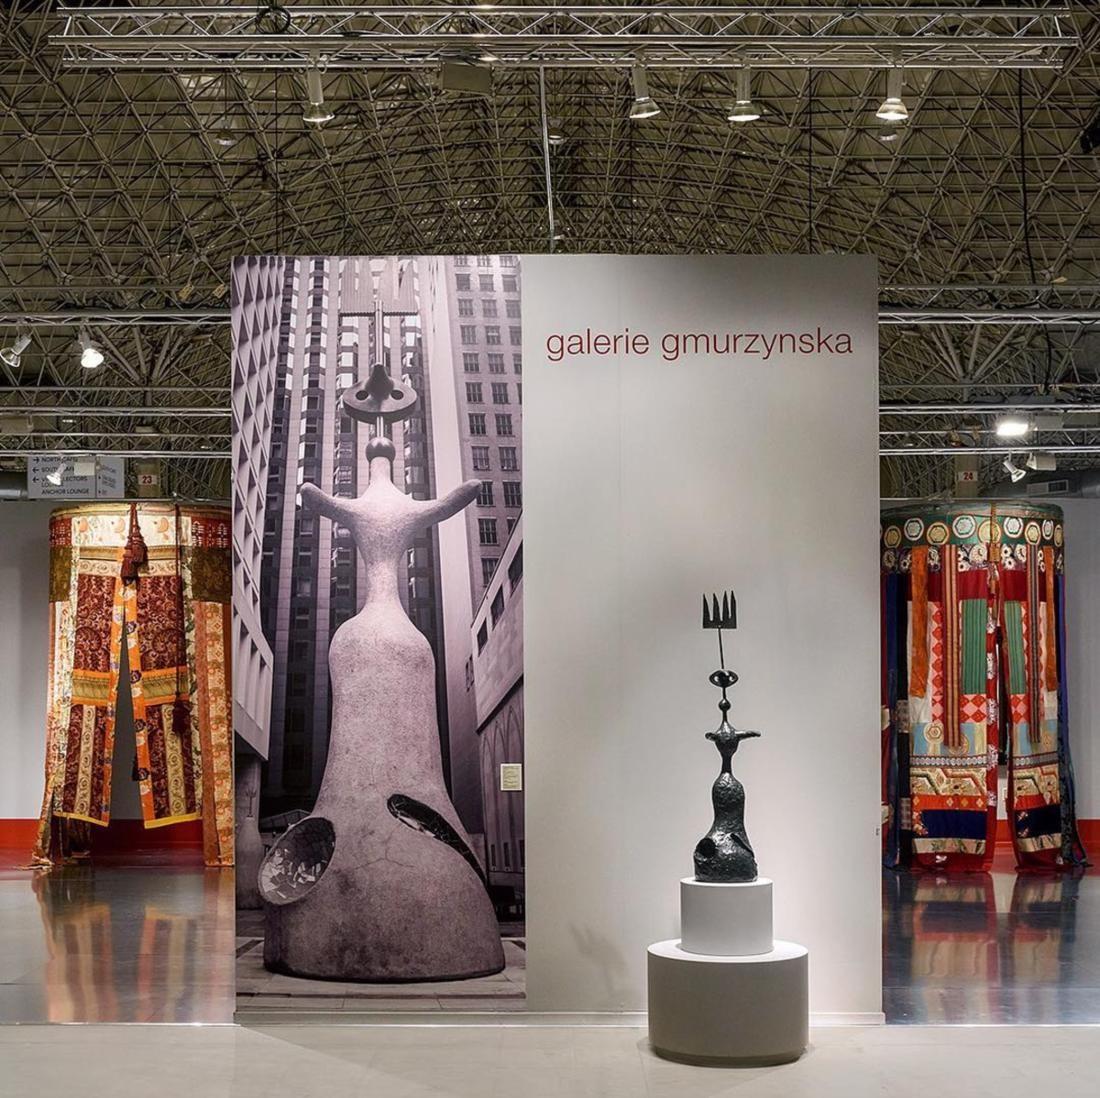 Installation view of Galerie Gmurzynska's booth at EXPO Chicago, 2017. Photo by @gmurzynska, via Instagram.